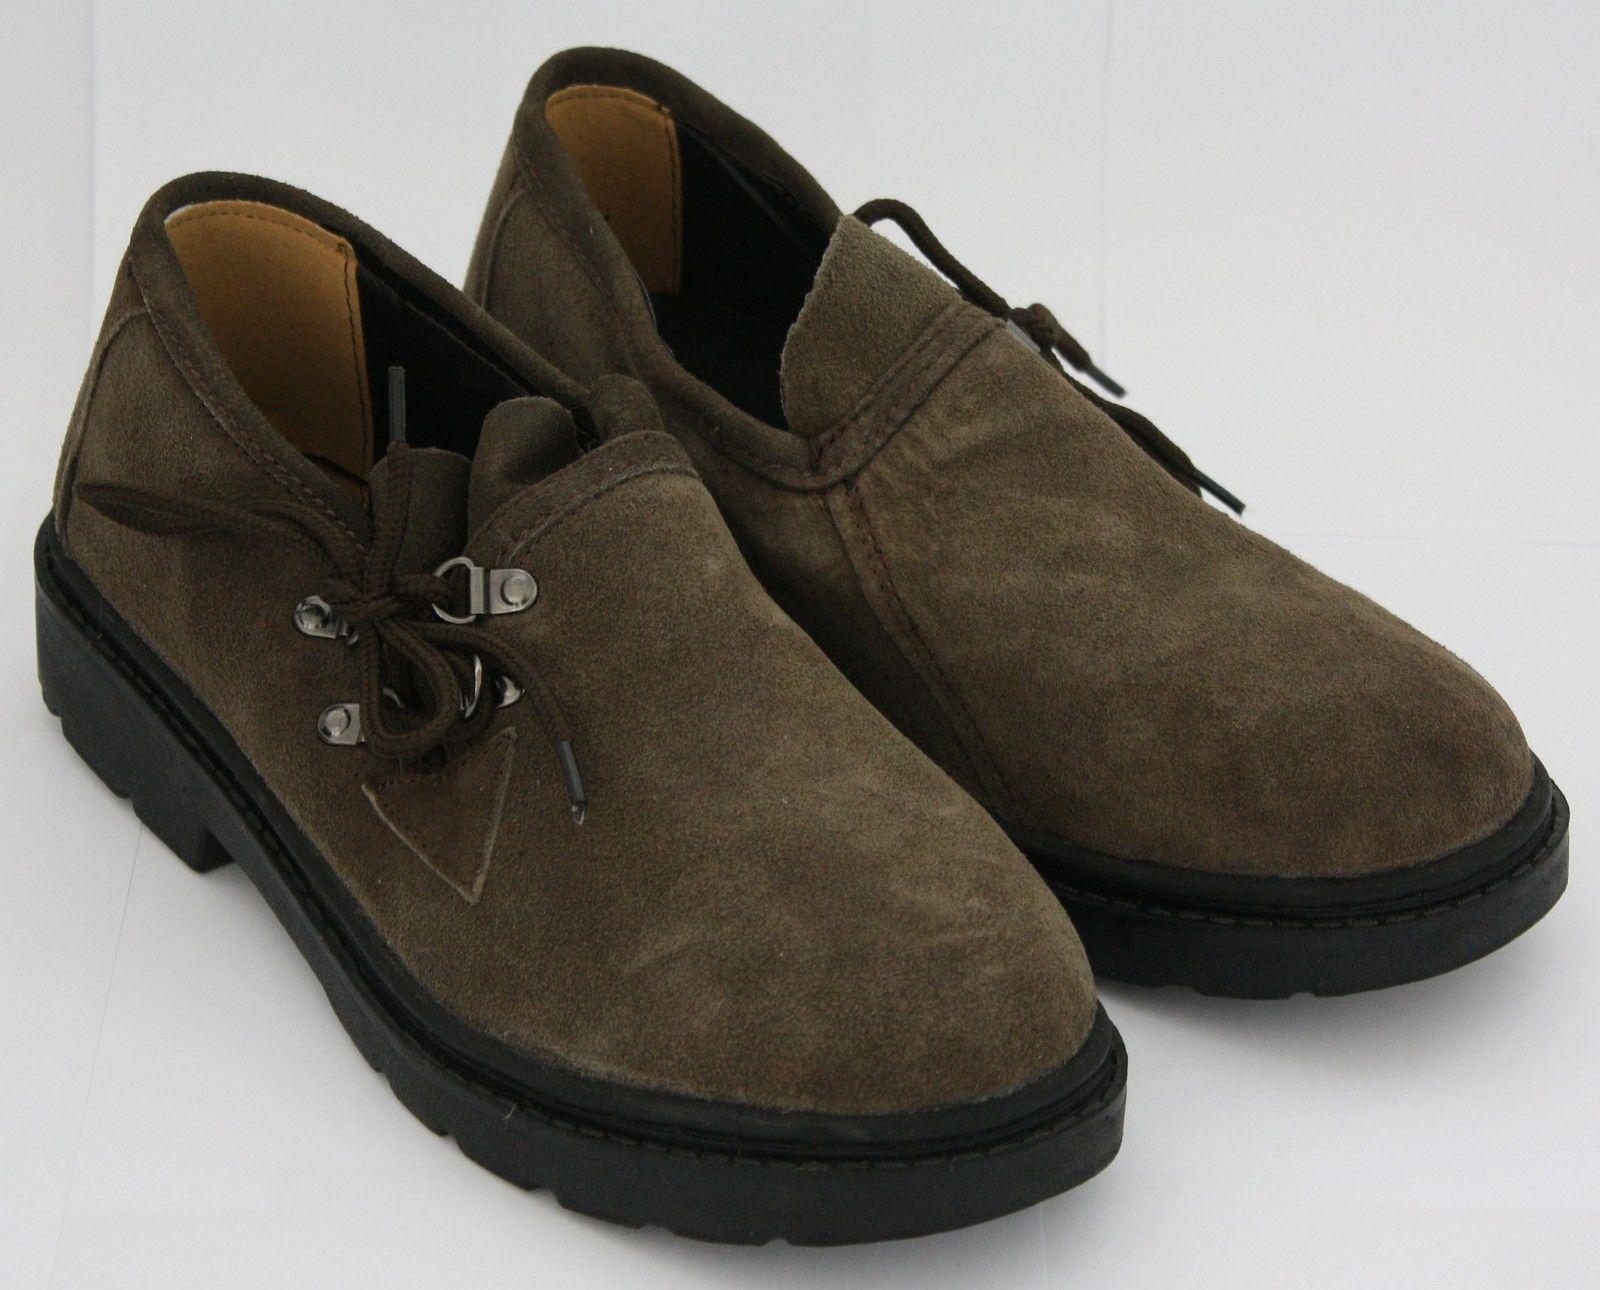 Homme costume chaussures brogues en cuir neuf gris brun 41 44 45 top marron ebay - Costume gris chaussure marron ...